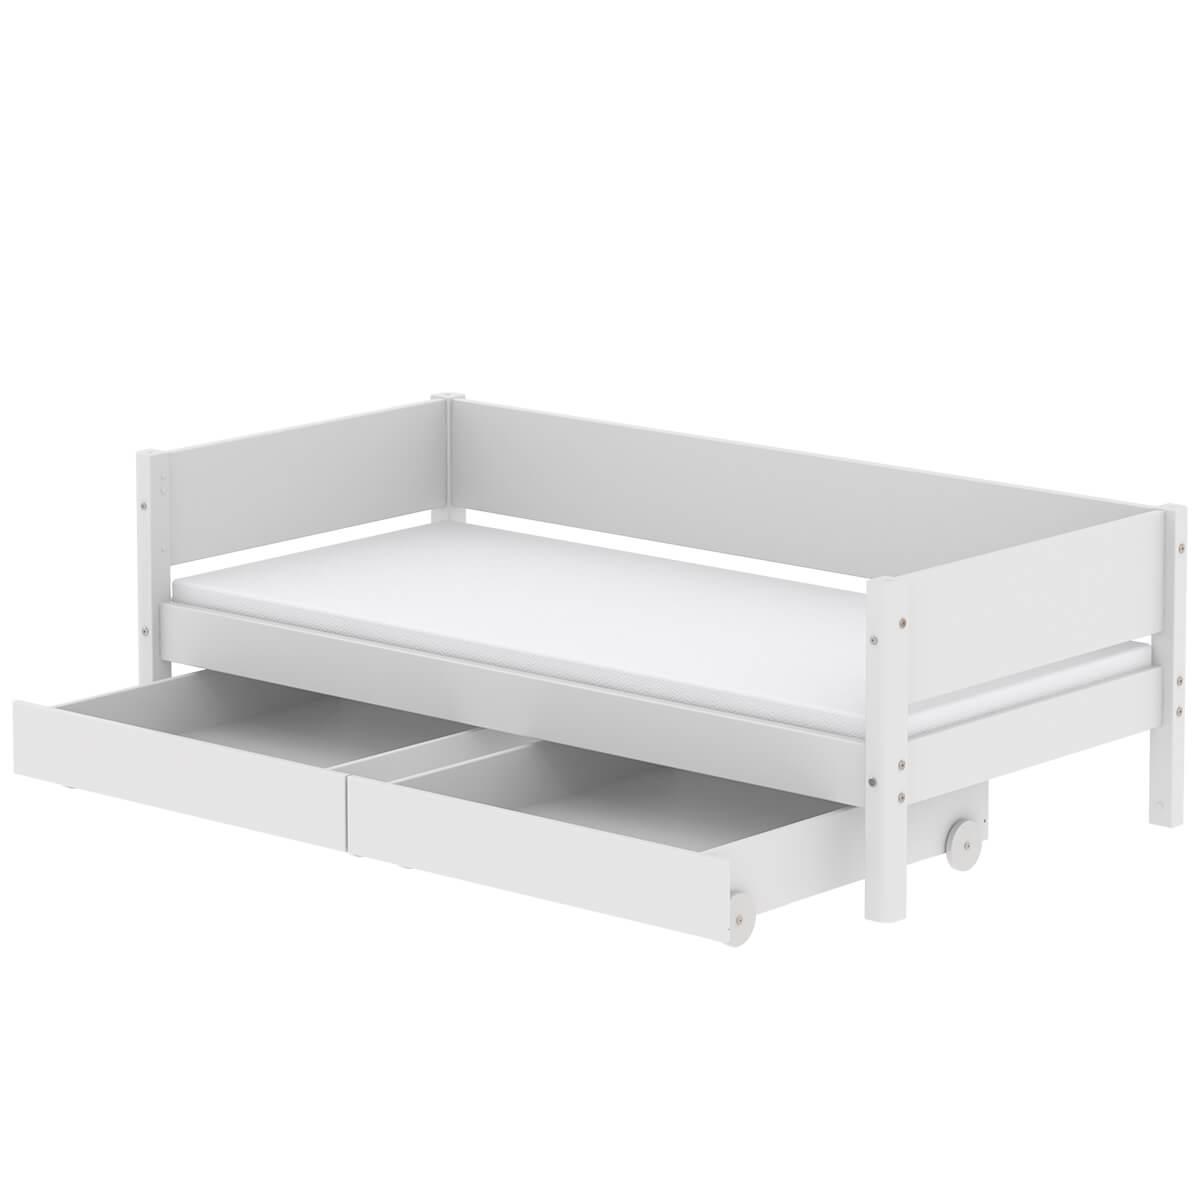 Lit enfant simple 90x190cm 2 tiroirs WHITE Flexa blanc